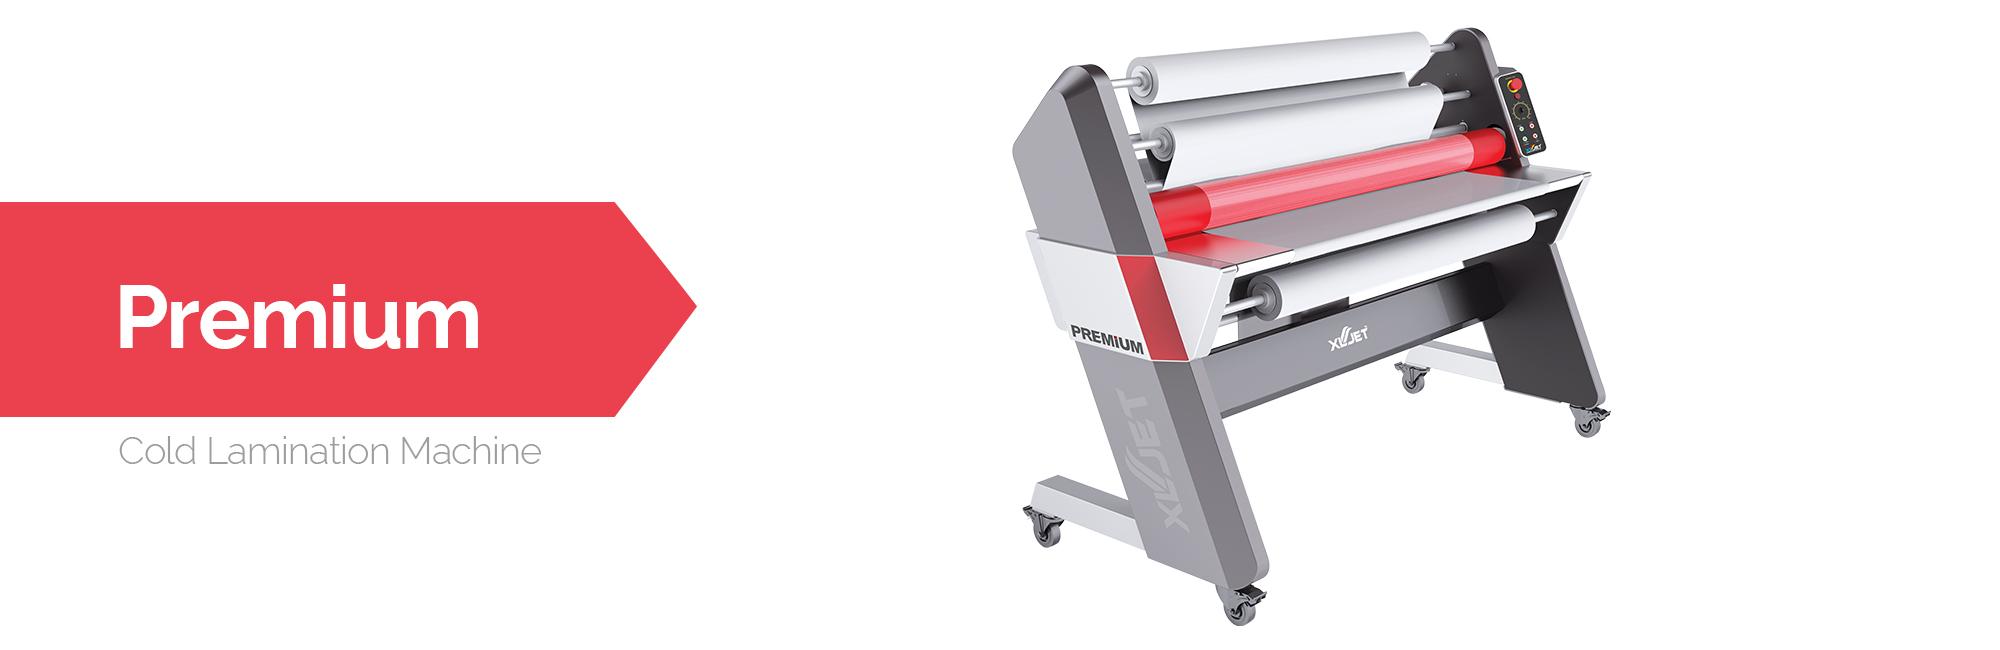 xljet lamination machine, lamination machines, b&r digitals